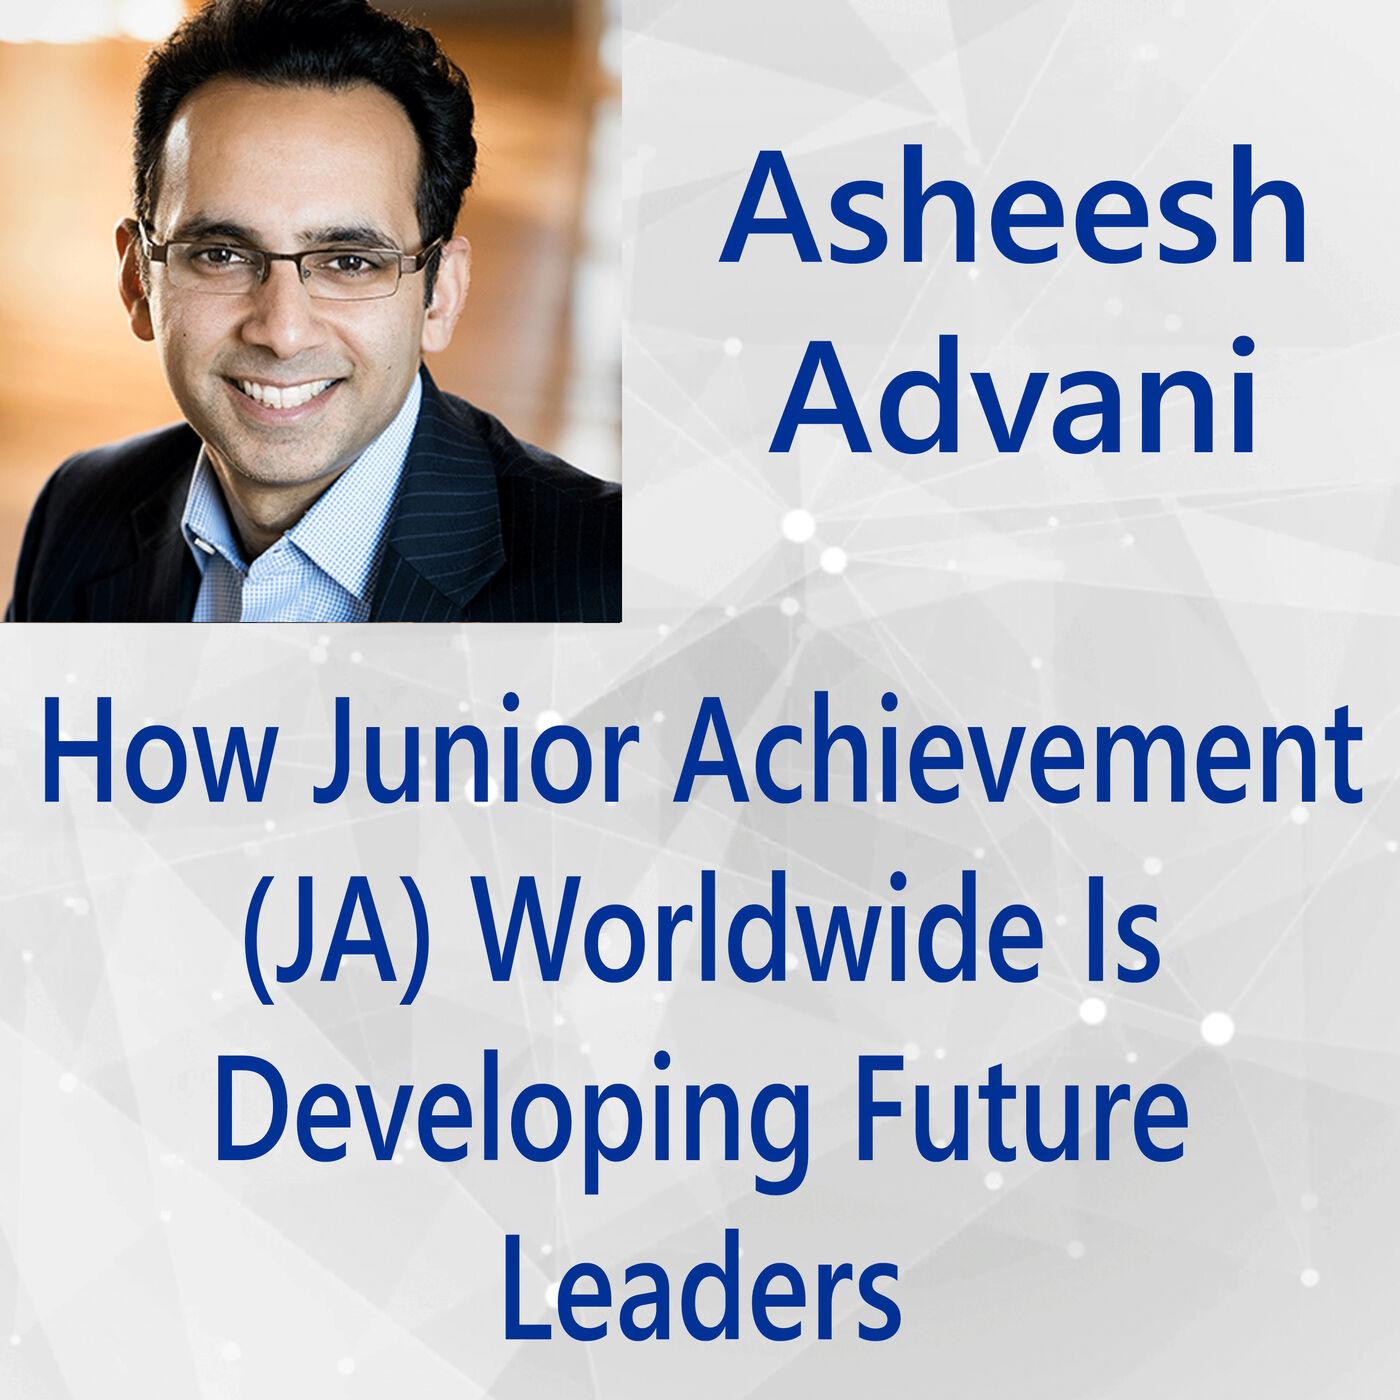 109: How Junior Achievement (JA) Worldwide Is Developing Future Leaders